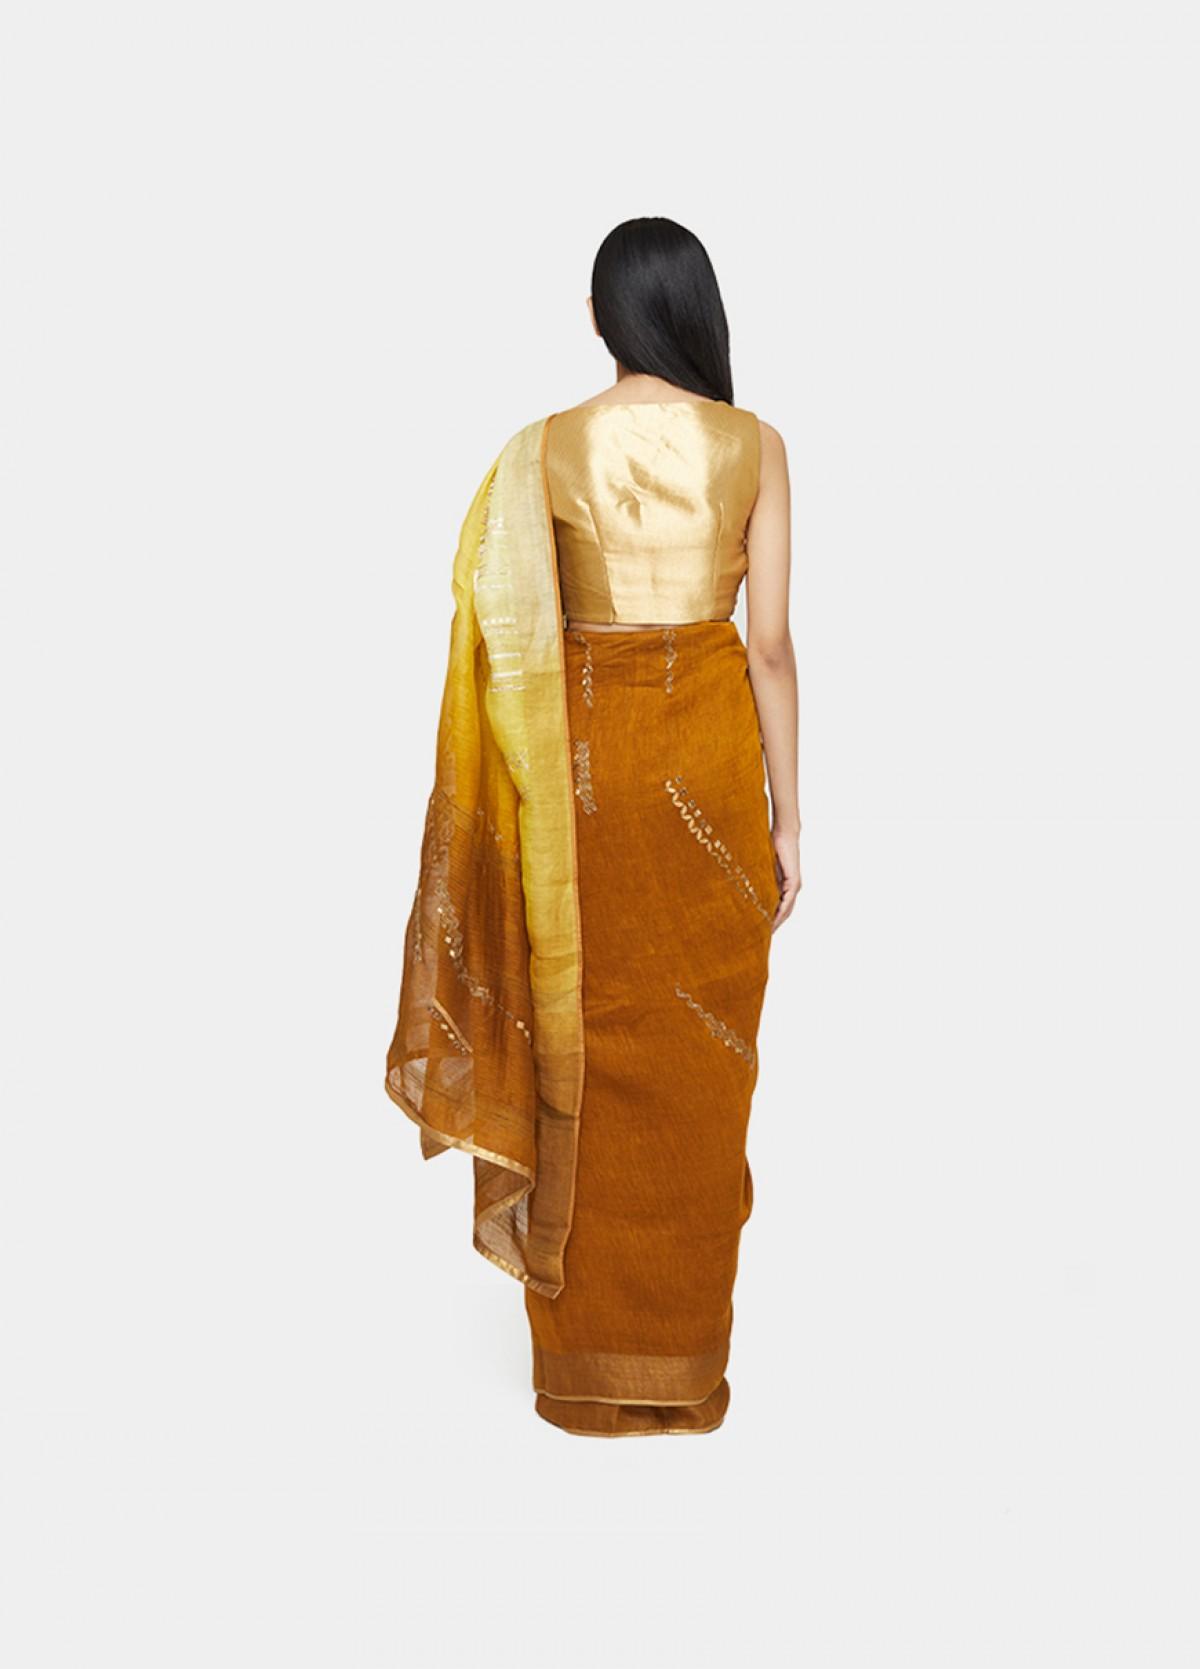 The Mandalakar Sari